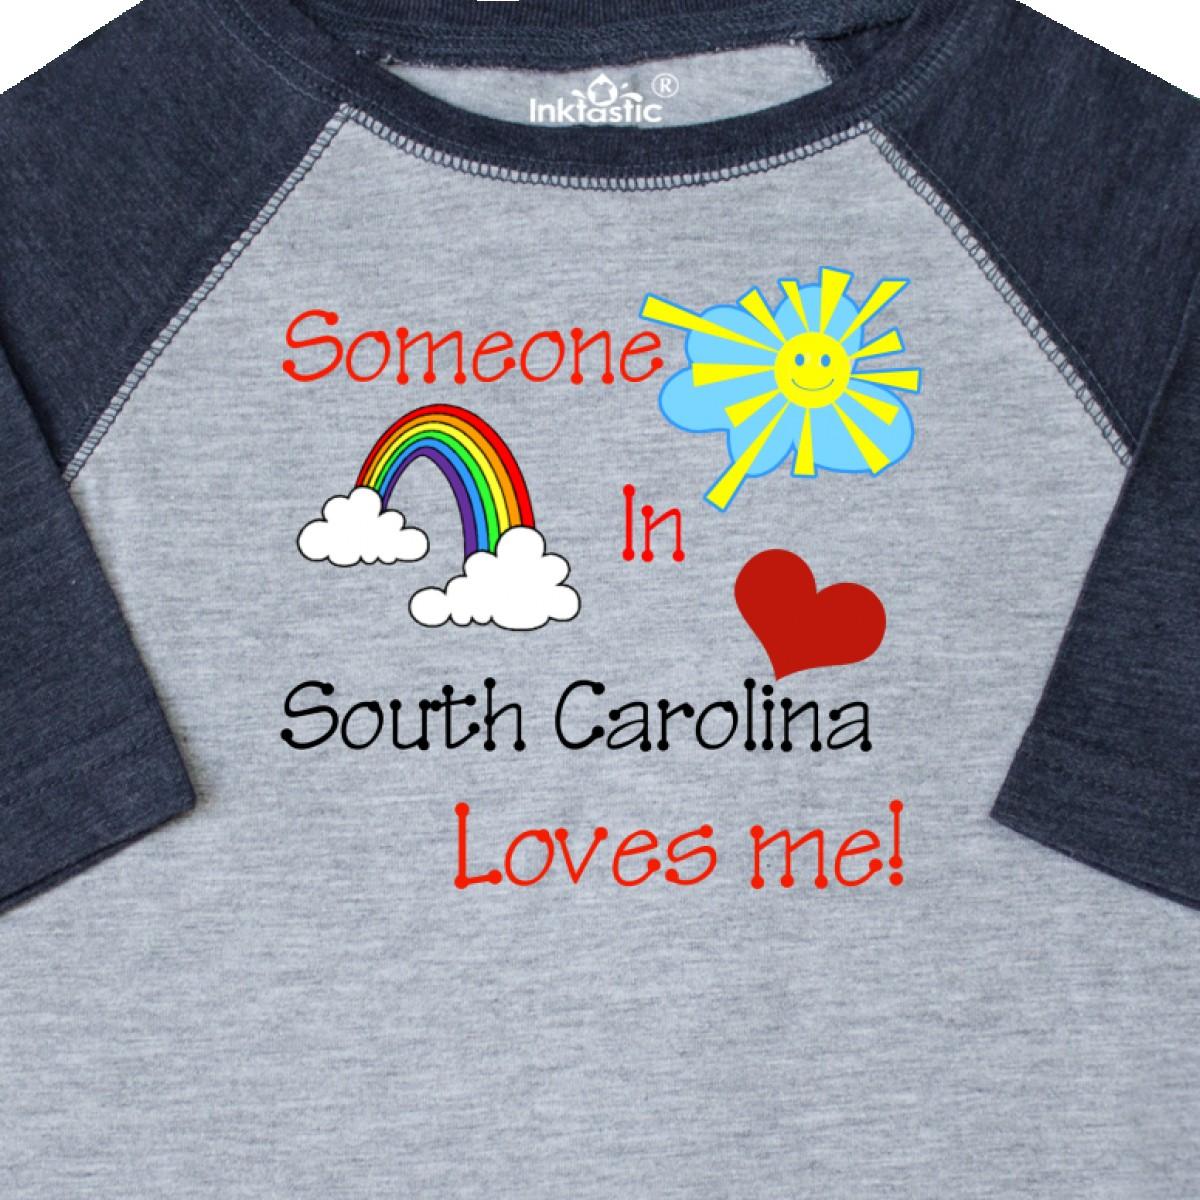 Inktastic-Someone-In-South-Carolina-Loves-Me-Toddler-T-Shirt-Love-Me-Rainbow thumbnail 4